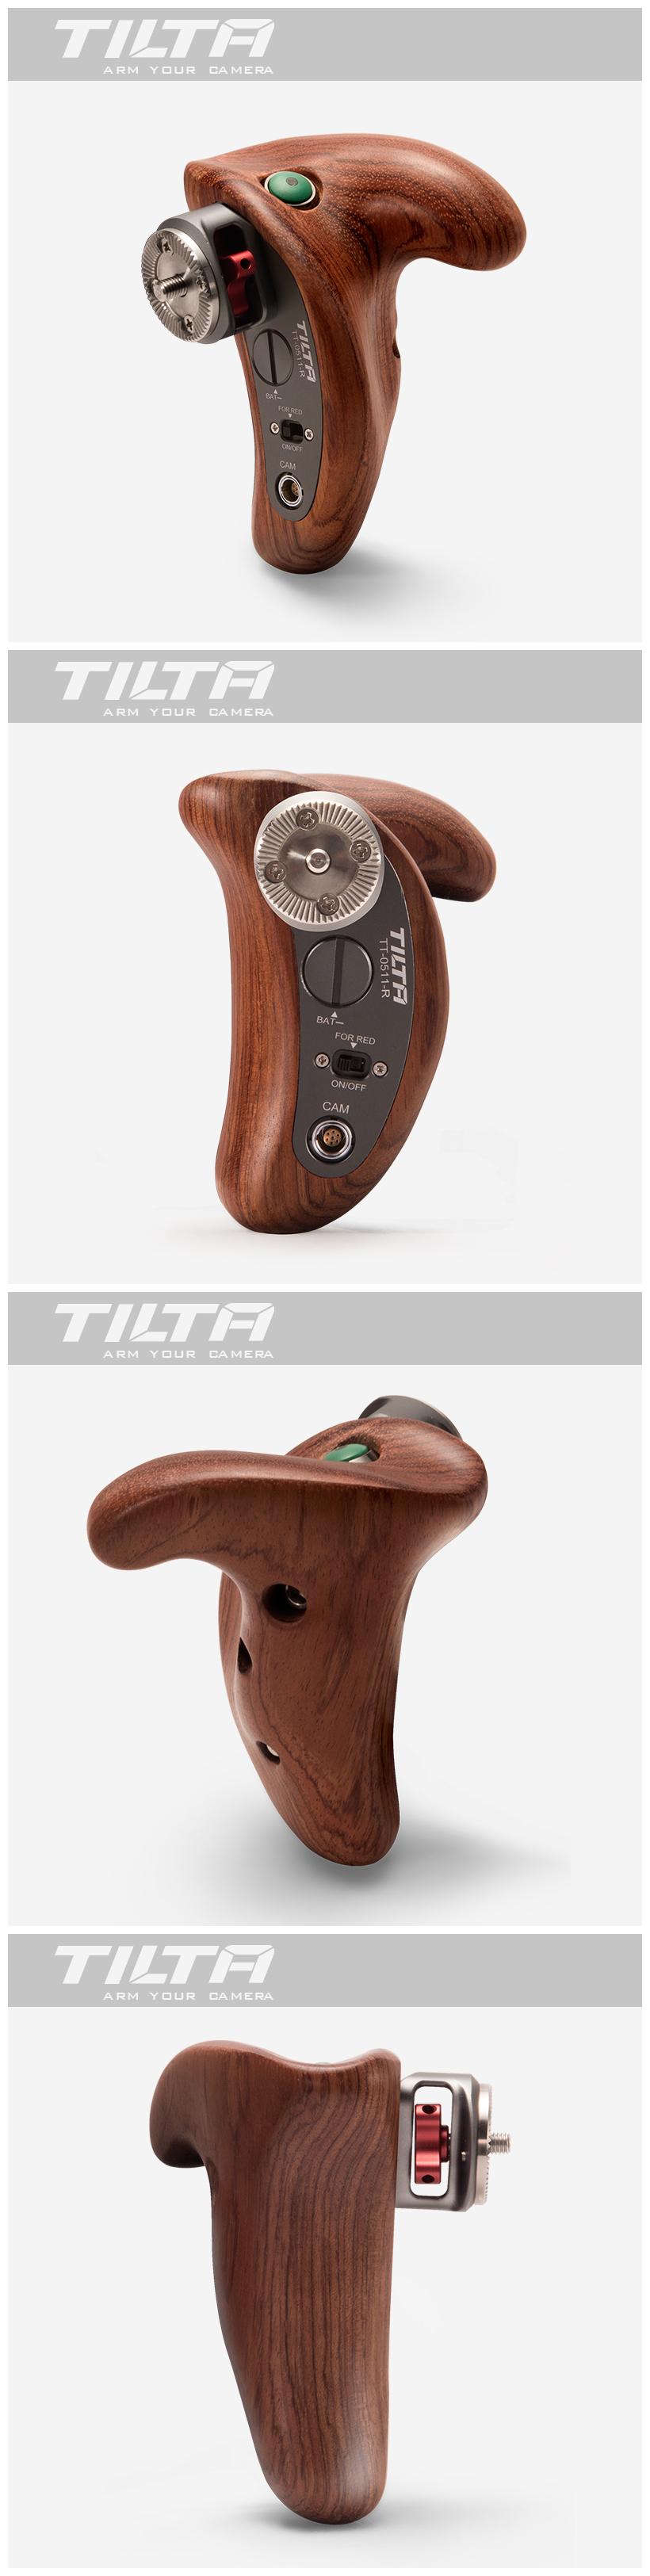 tilta TT-0509-R new